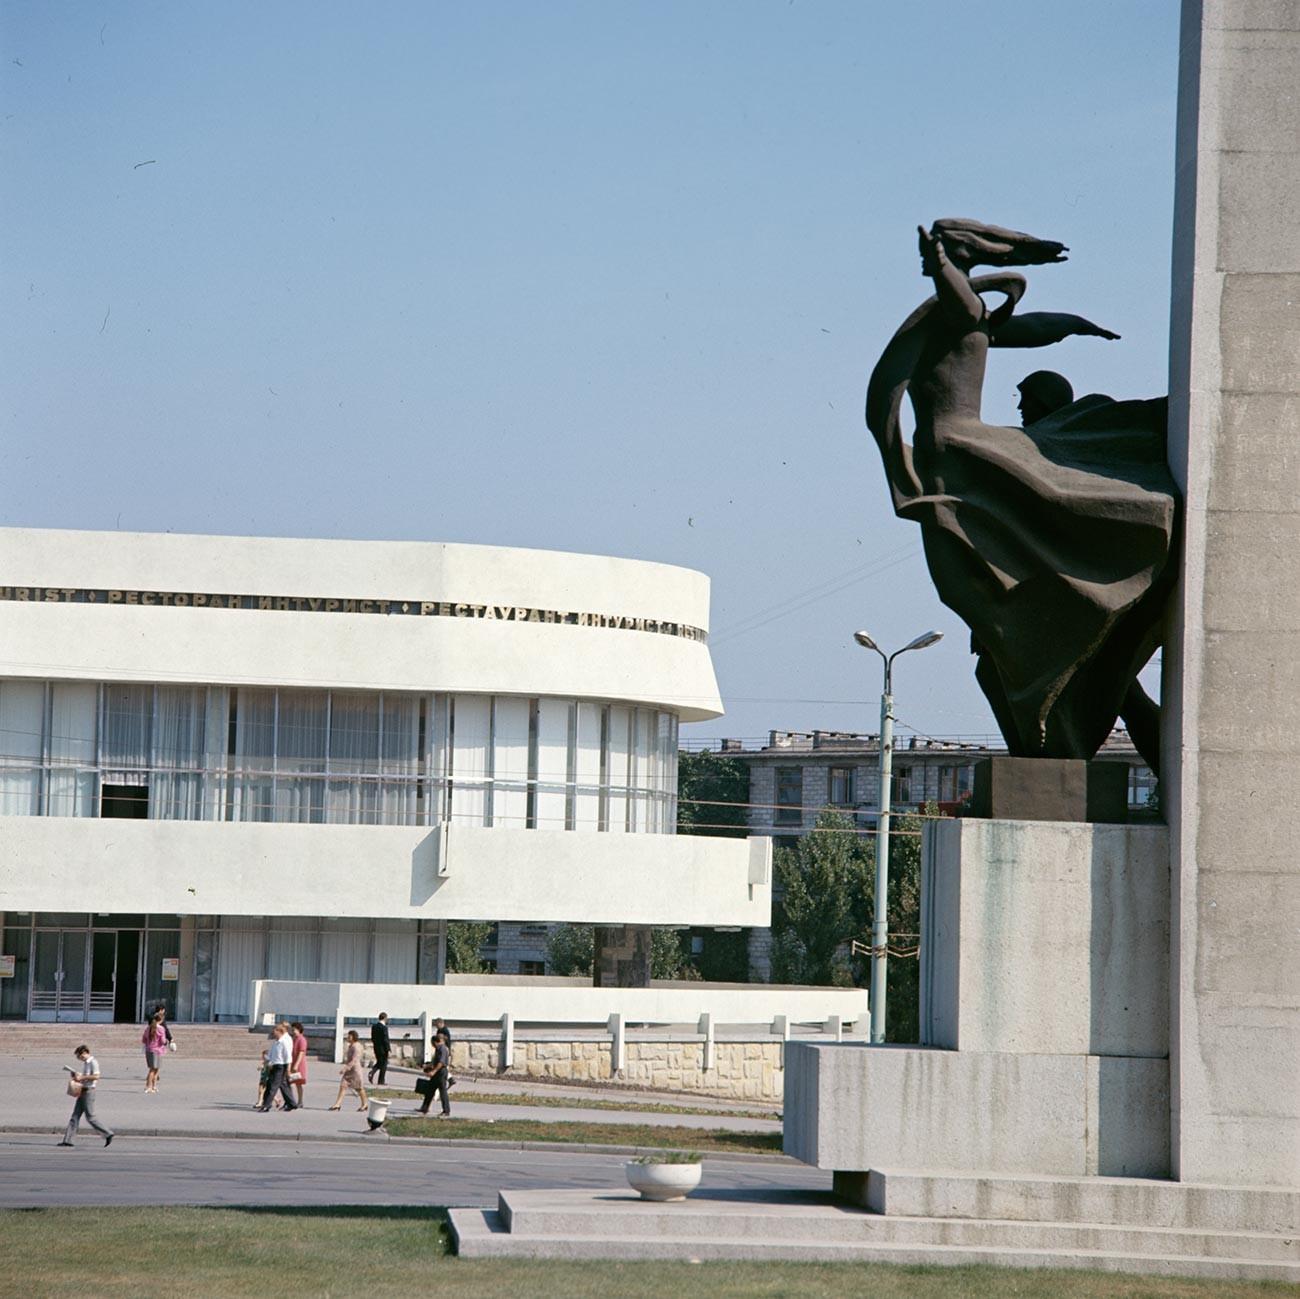 Памятник освободителям Кишинева от немецко-фашистских войск, 1974